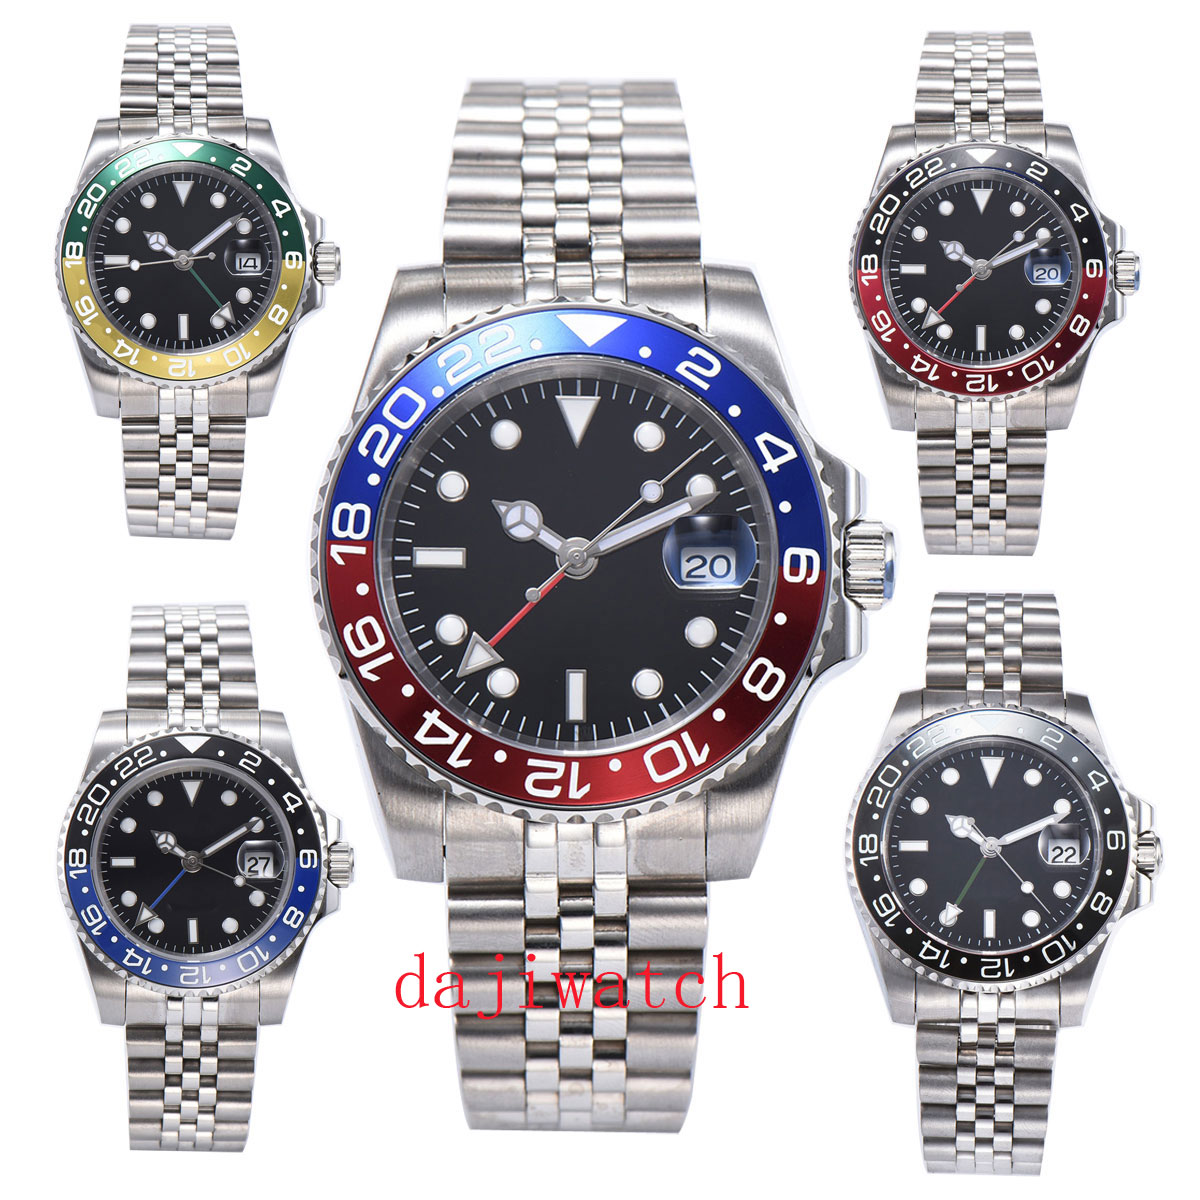 40mm Panis black dial luminous sapphire glass ceramic bezel GMT automatic watch male luxury brand top mechanical watch